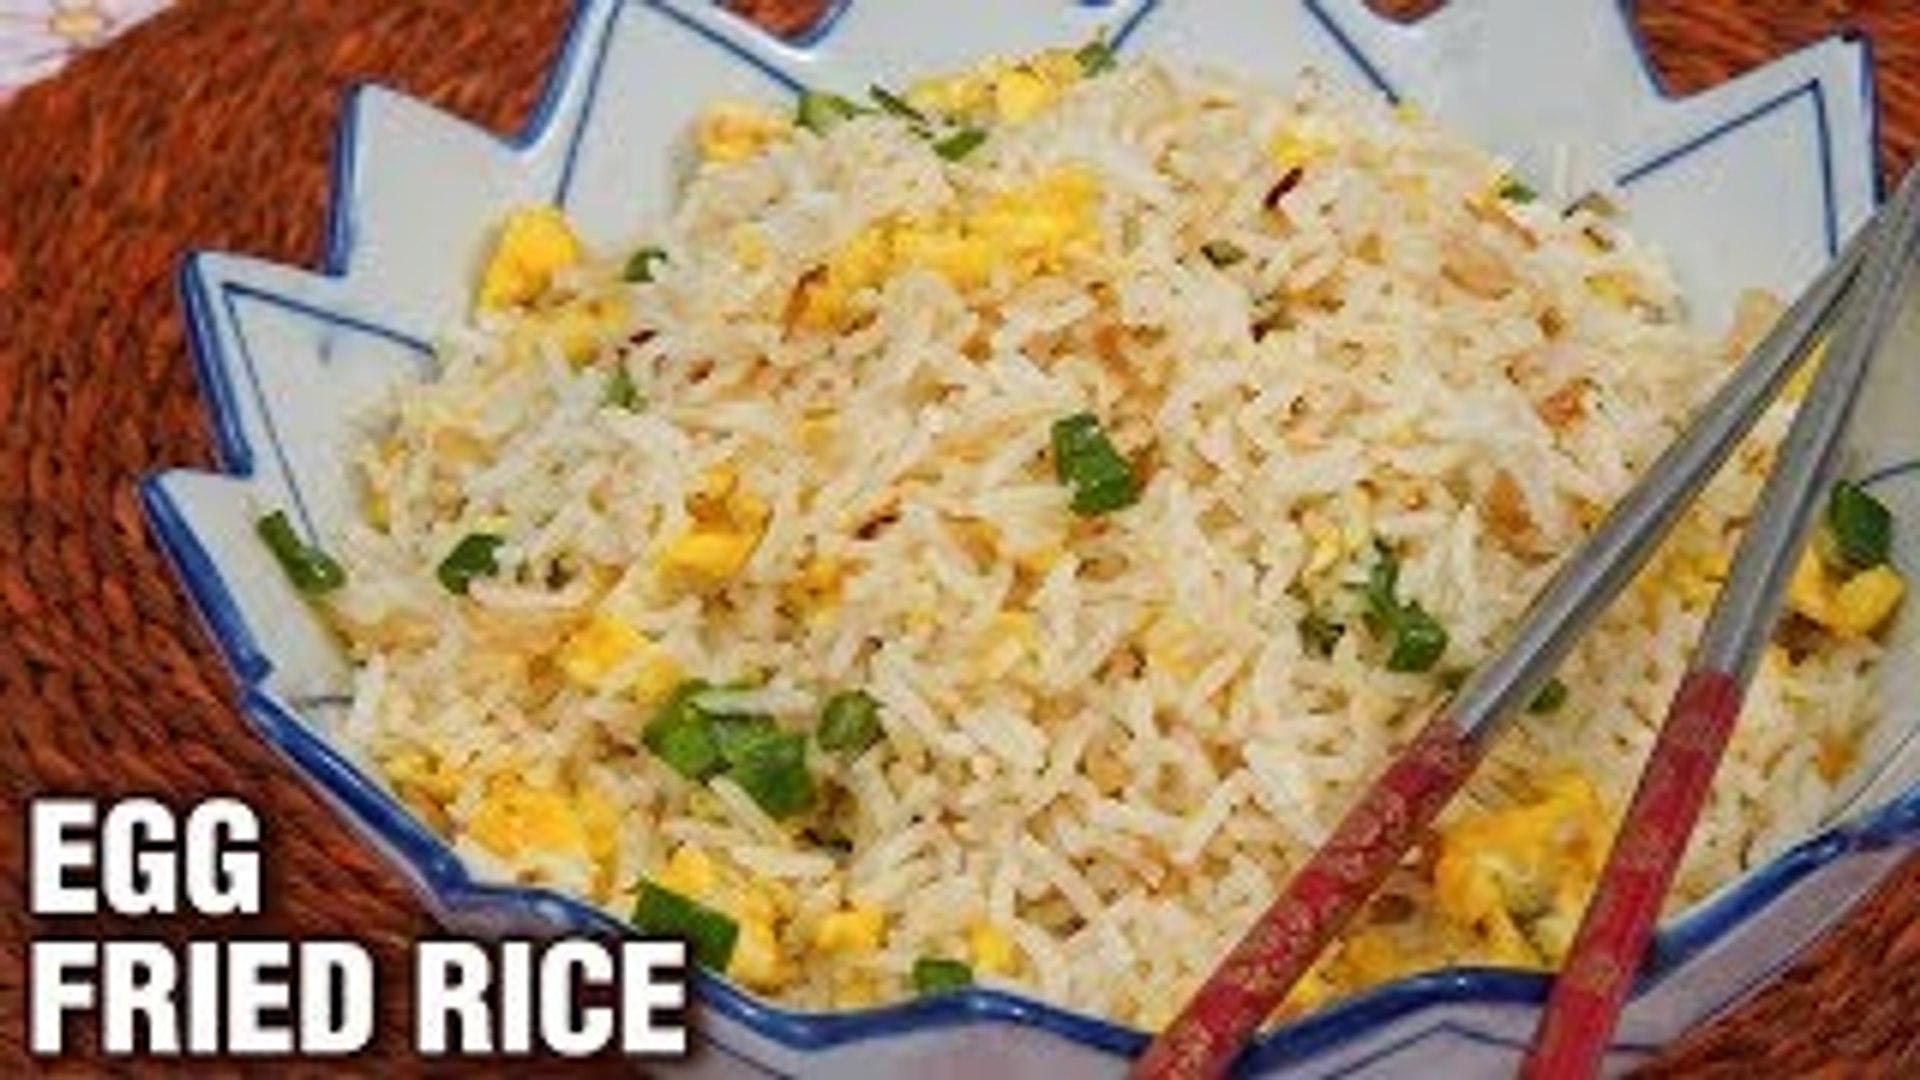 Egg Fried Rice Recipe - Quick & Easy Fried Rice Recipe - Indo-Chinese Recipe - Tarika